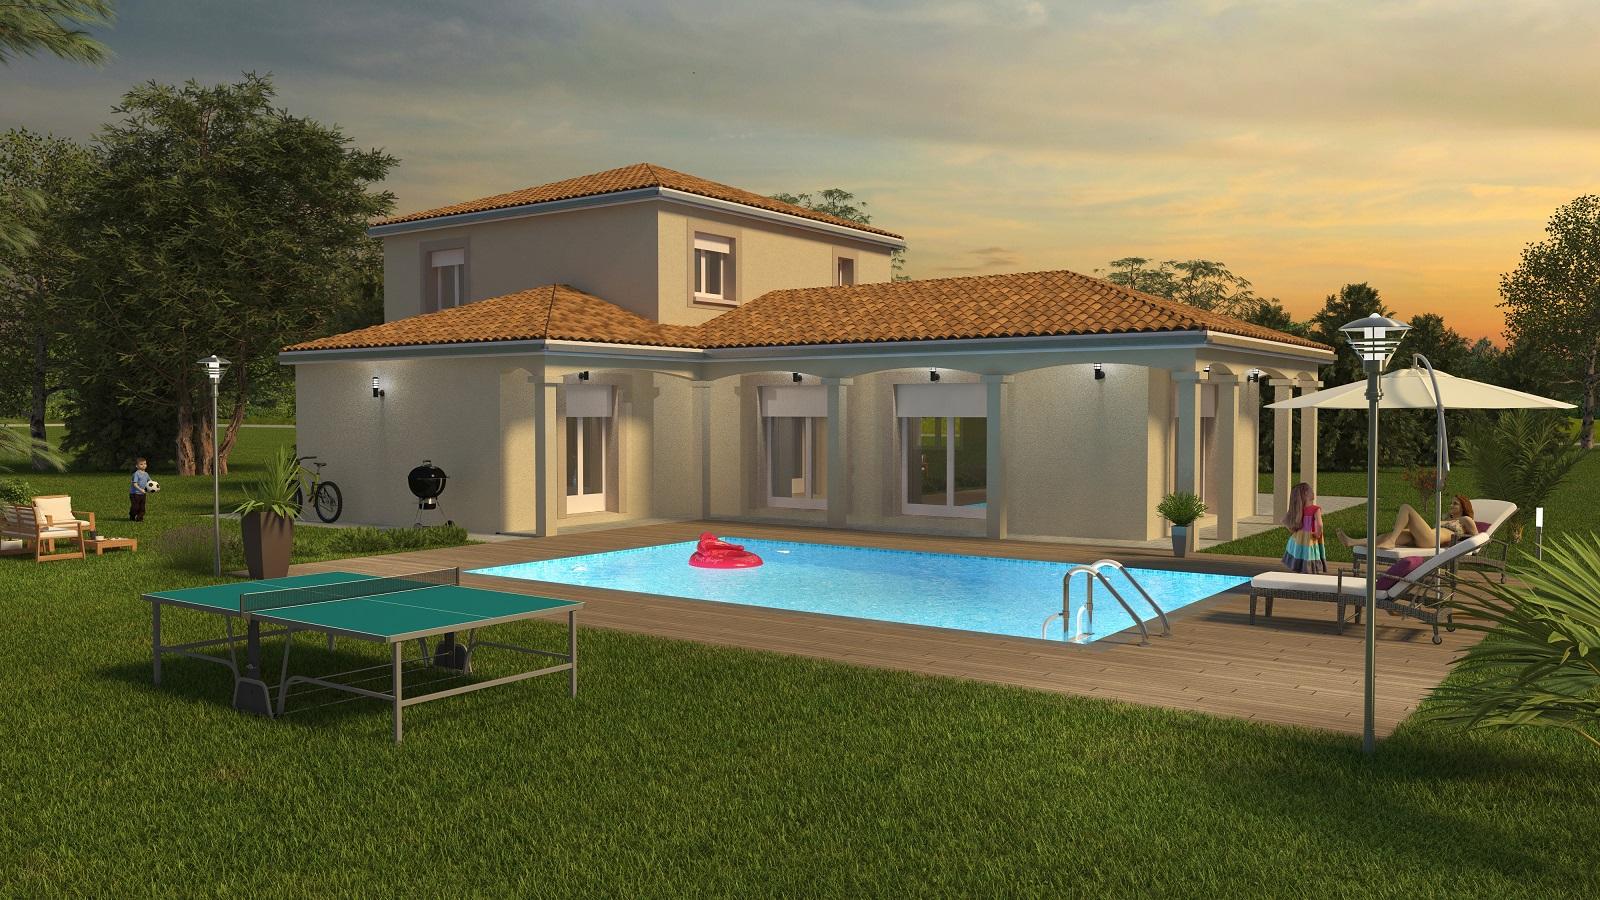 Bourgogne b tir constructeur de maisons individuelles for Constructeur de maison individuelle qui recrute